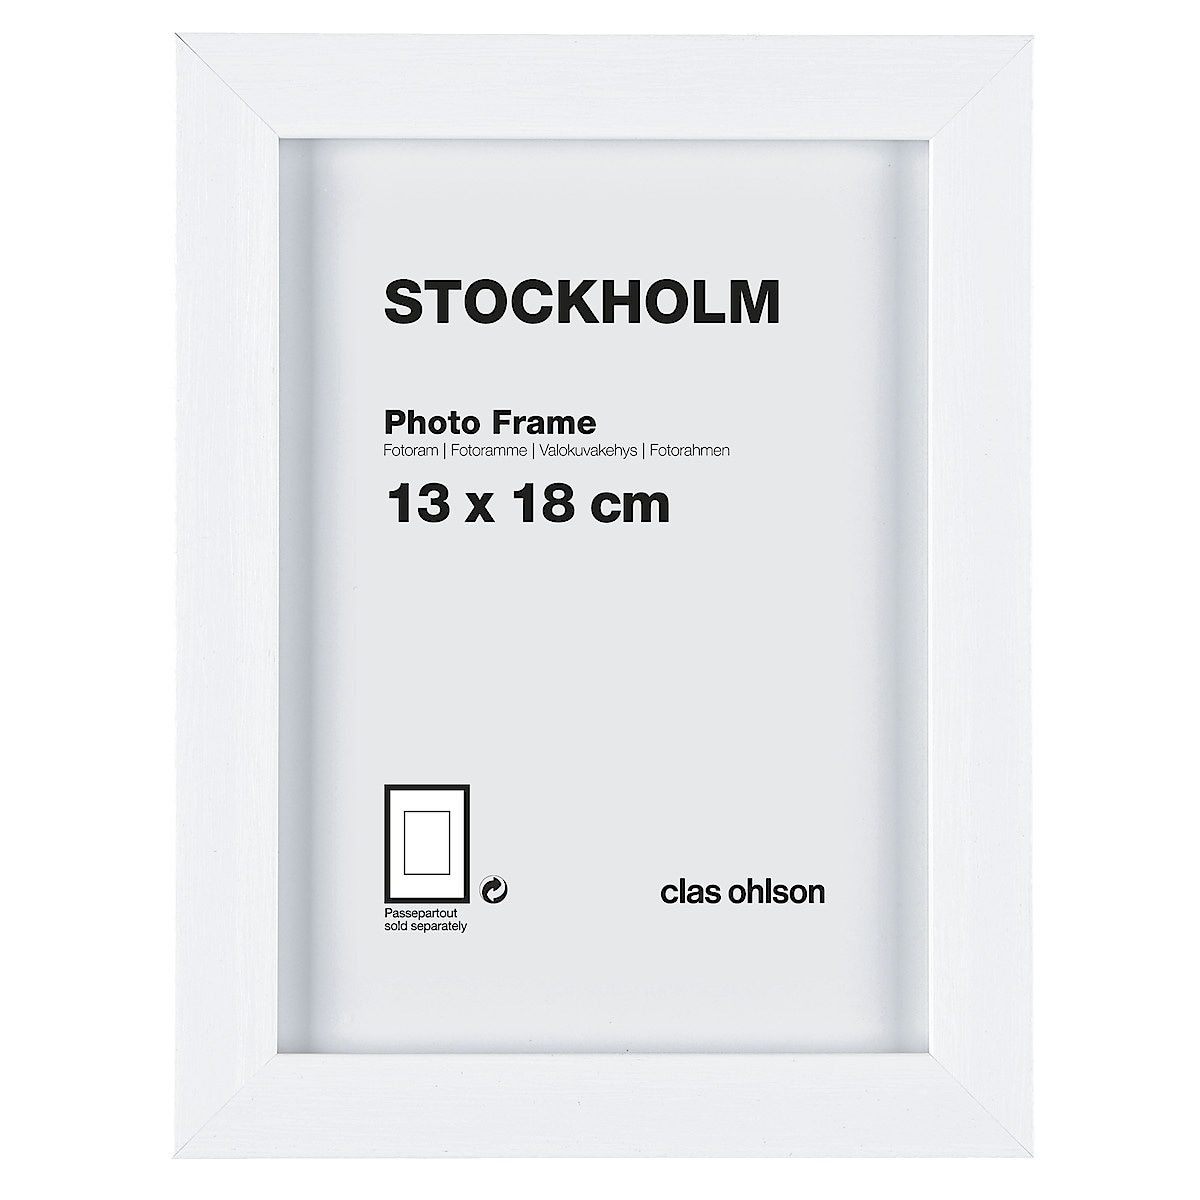 Fotoram Stockholm vit